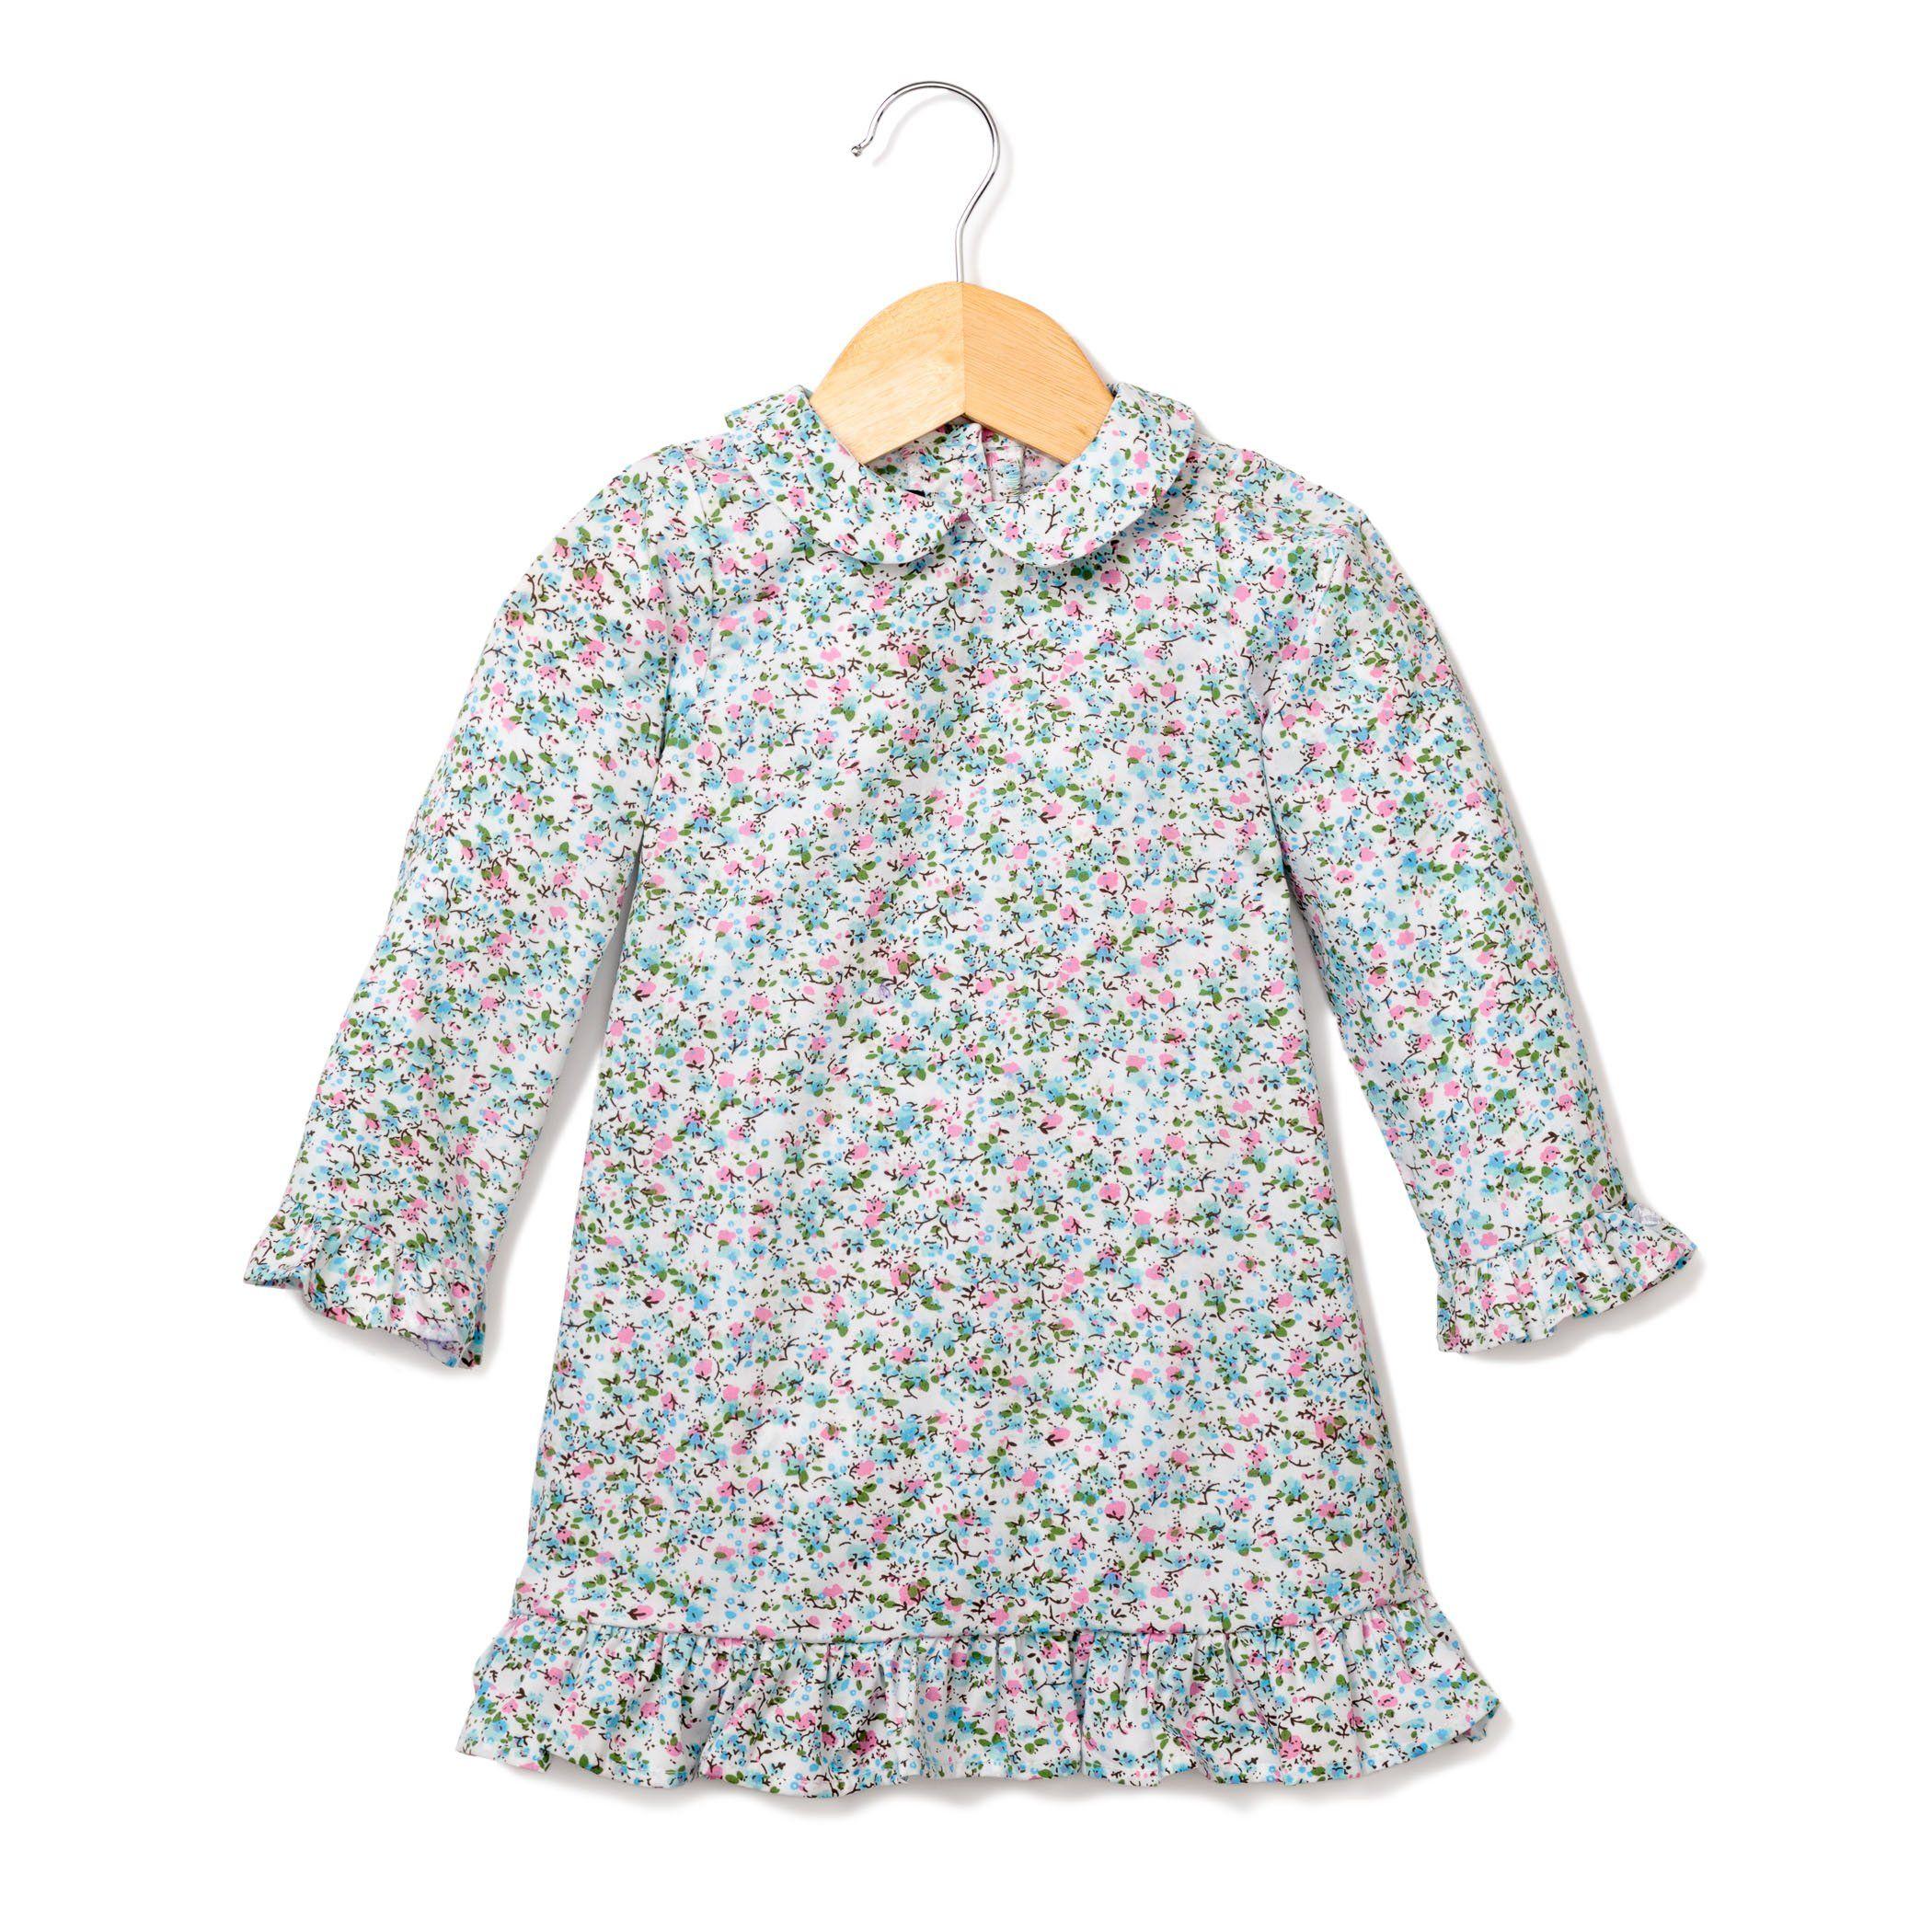 e43e4543ca19 Floral Whisper Sophia Nightgown from Petite Plume  kids  sleepwear  pjs   pajamas  blue  christmas  winter  gift  children  kidswear  childrenswear   jammies ...